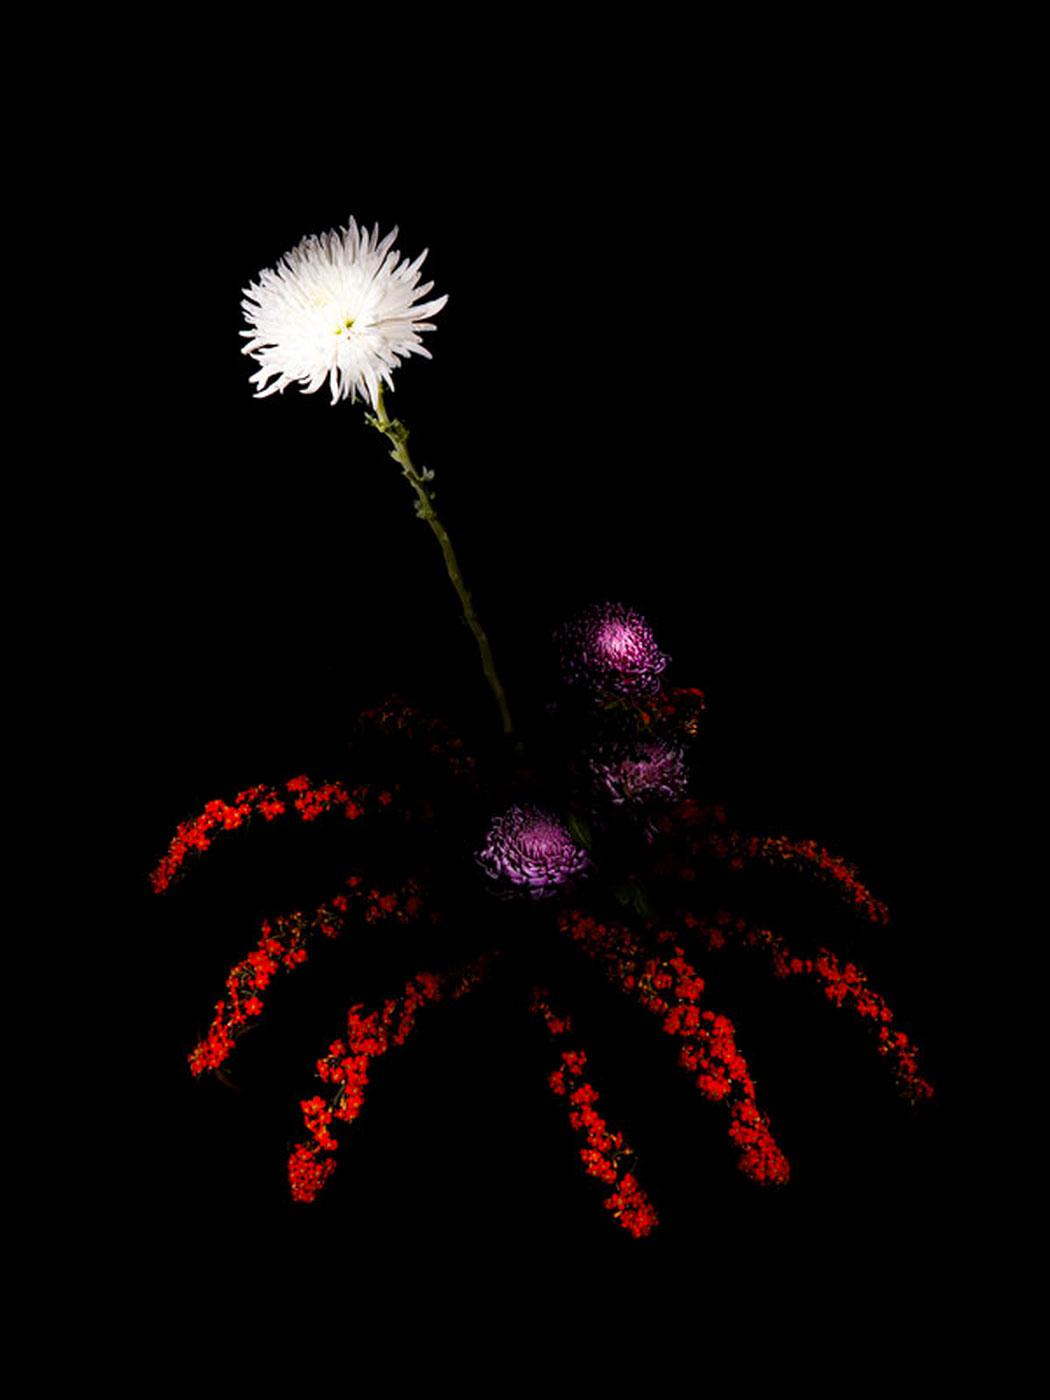 sarah-illenberger-flowerwork-03.jpg